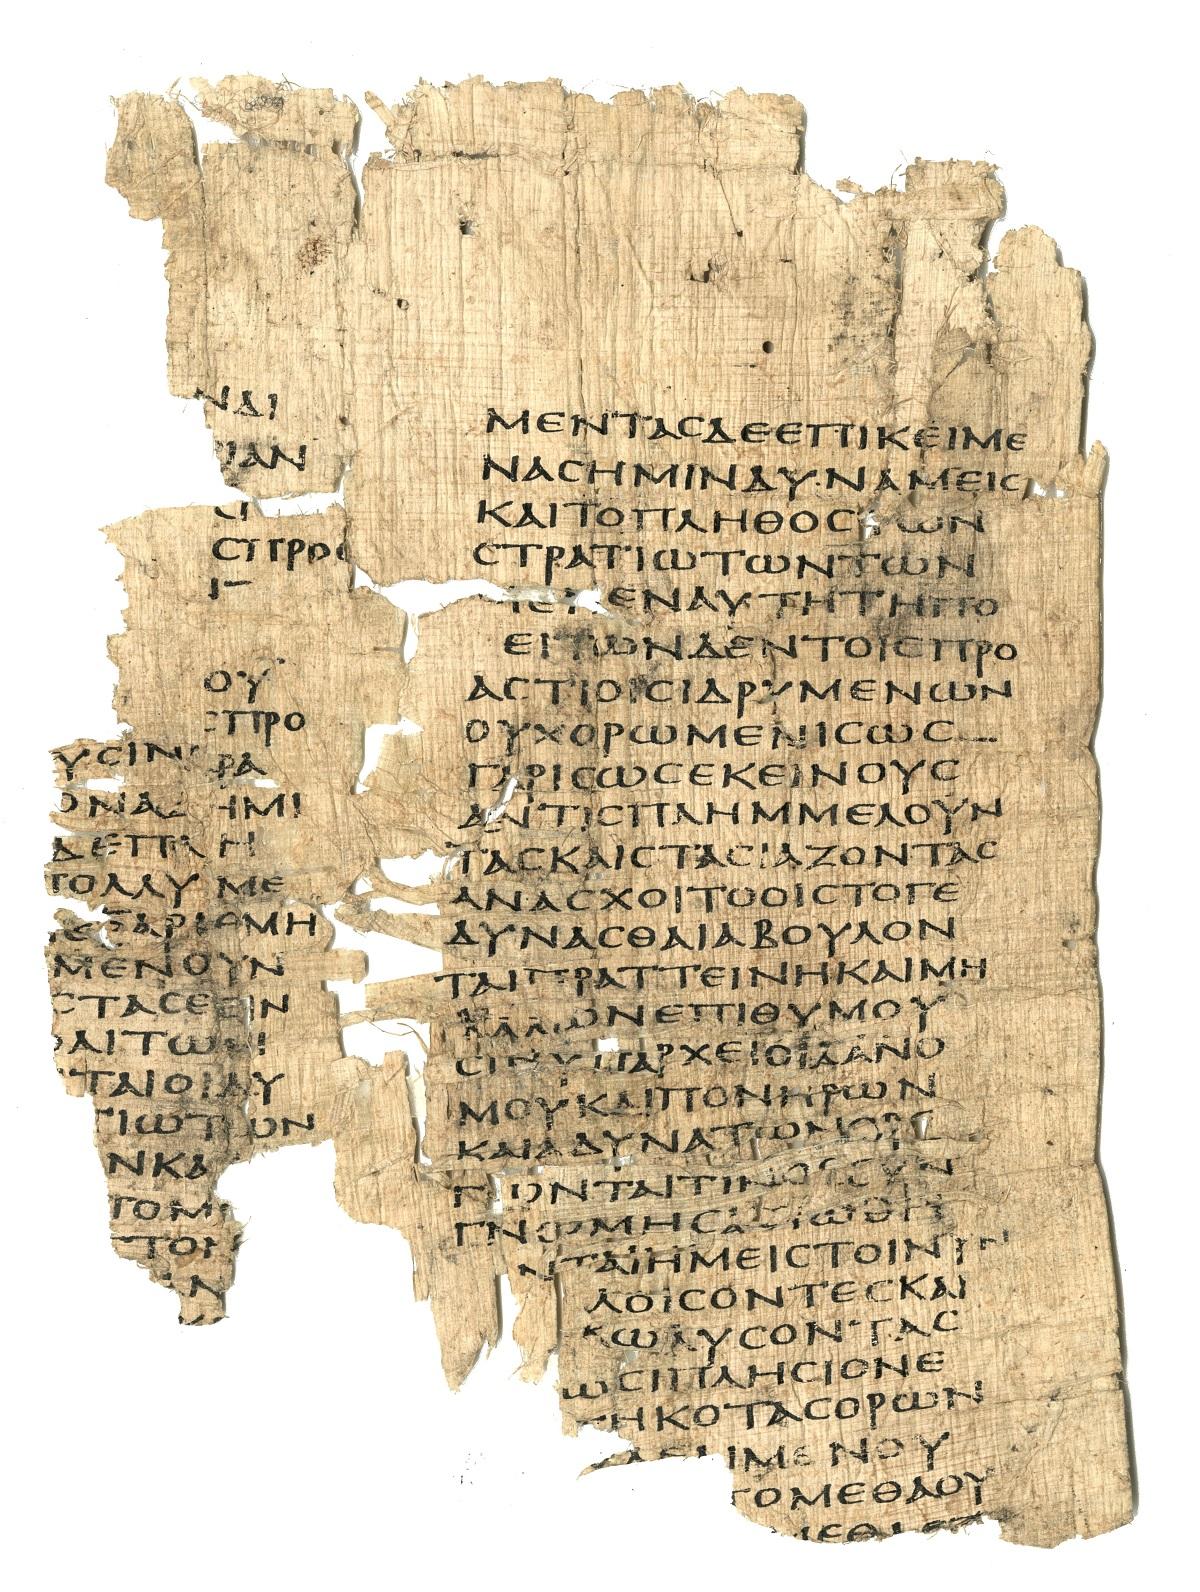 PSI XIV 1396 fr. A